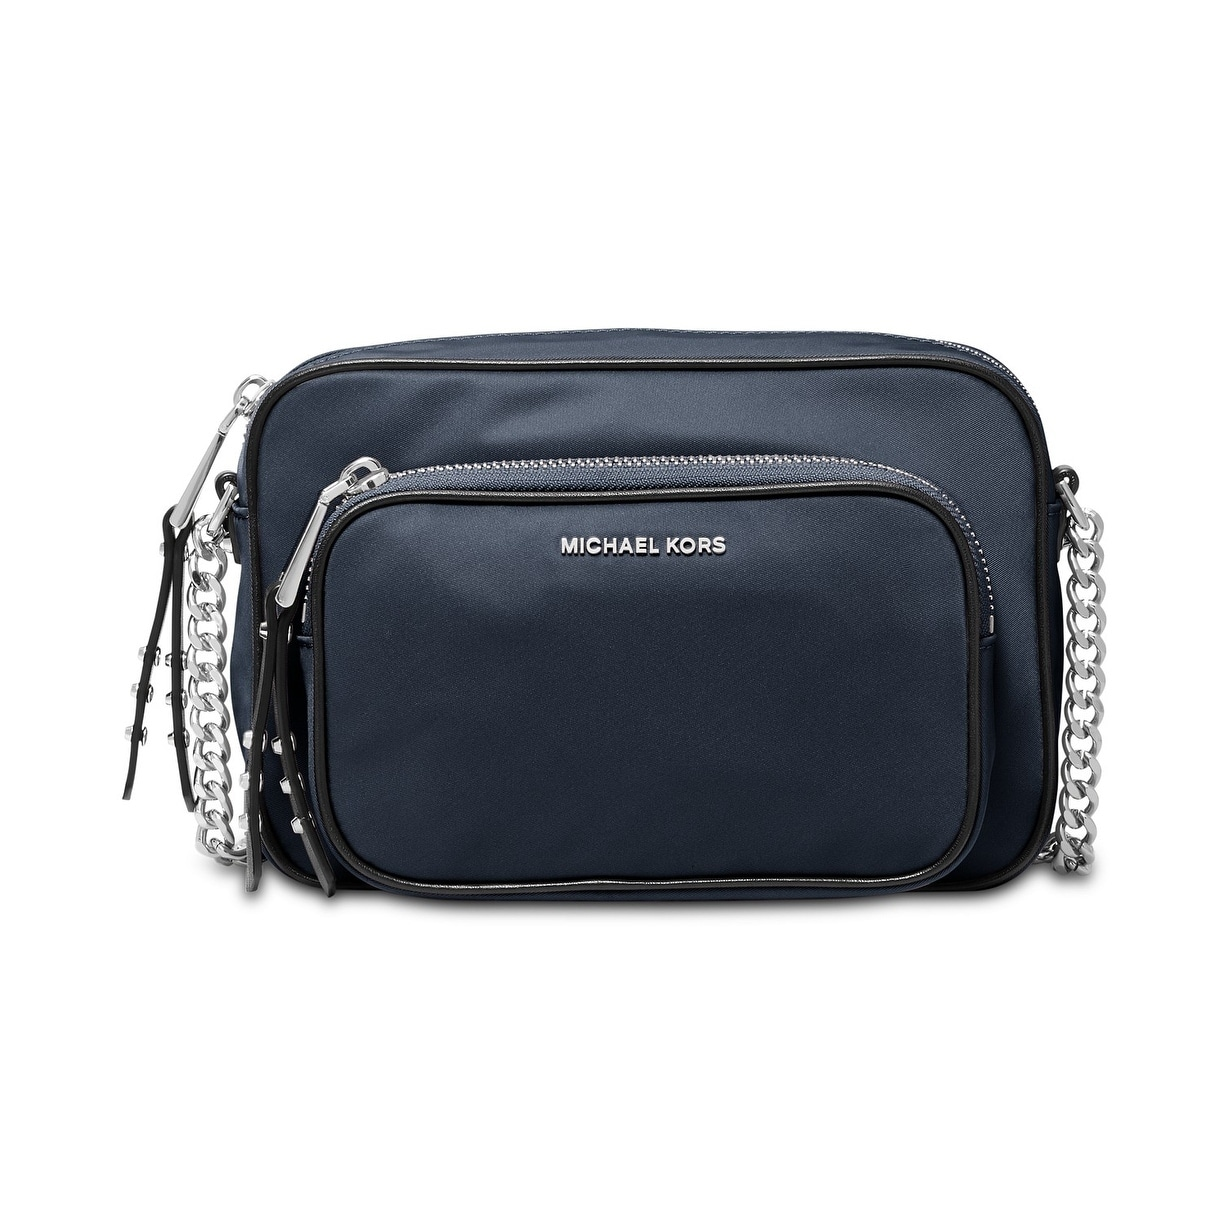 Michael Kors Leila Nylon Camera Bag: : Schuhe